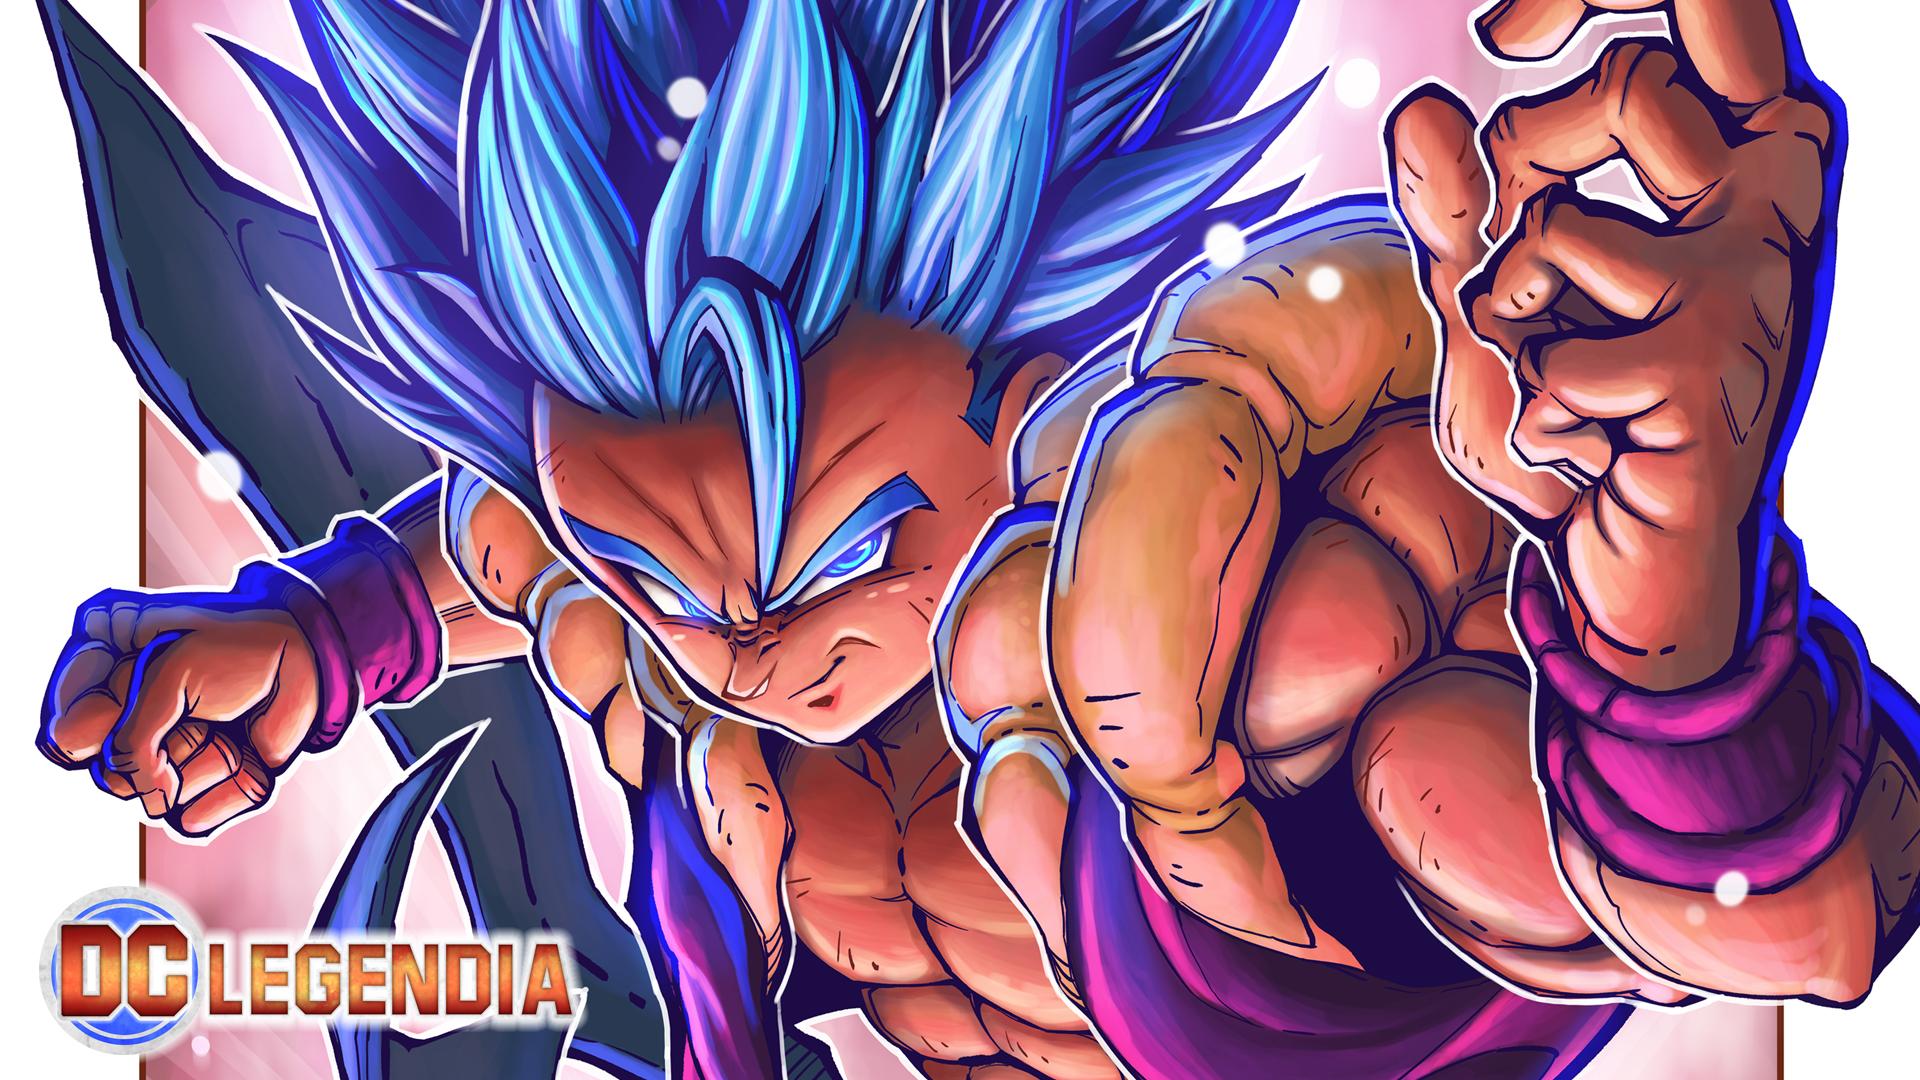 Gogeta Hd Wallpaper Background Image 1920x1080 Id 991792